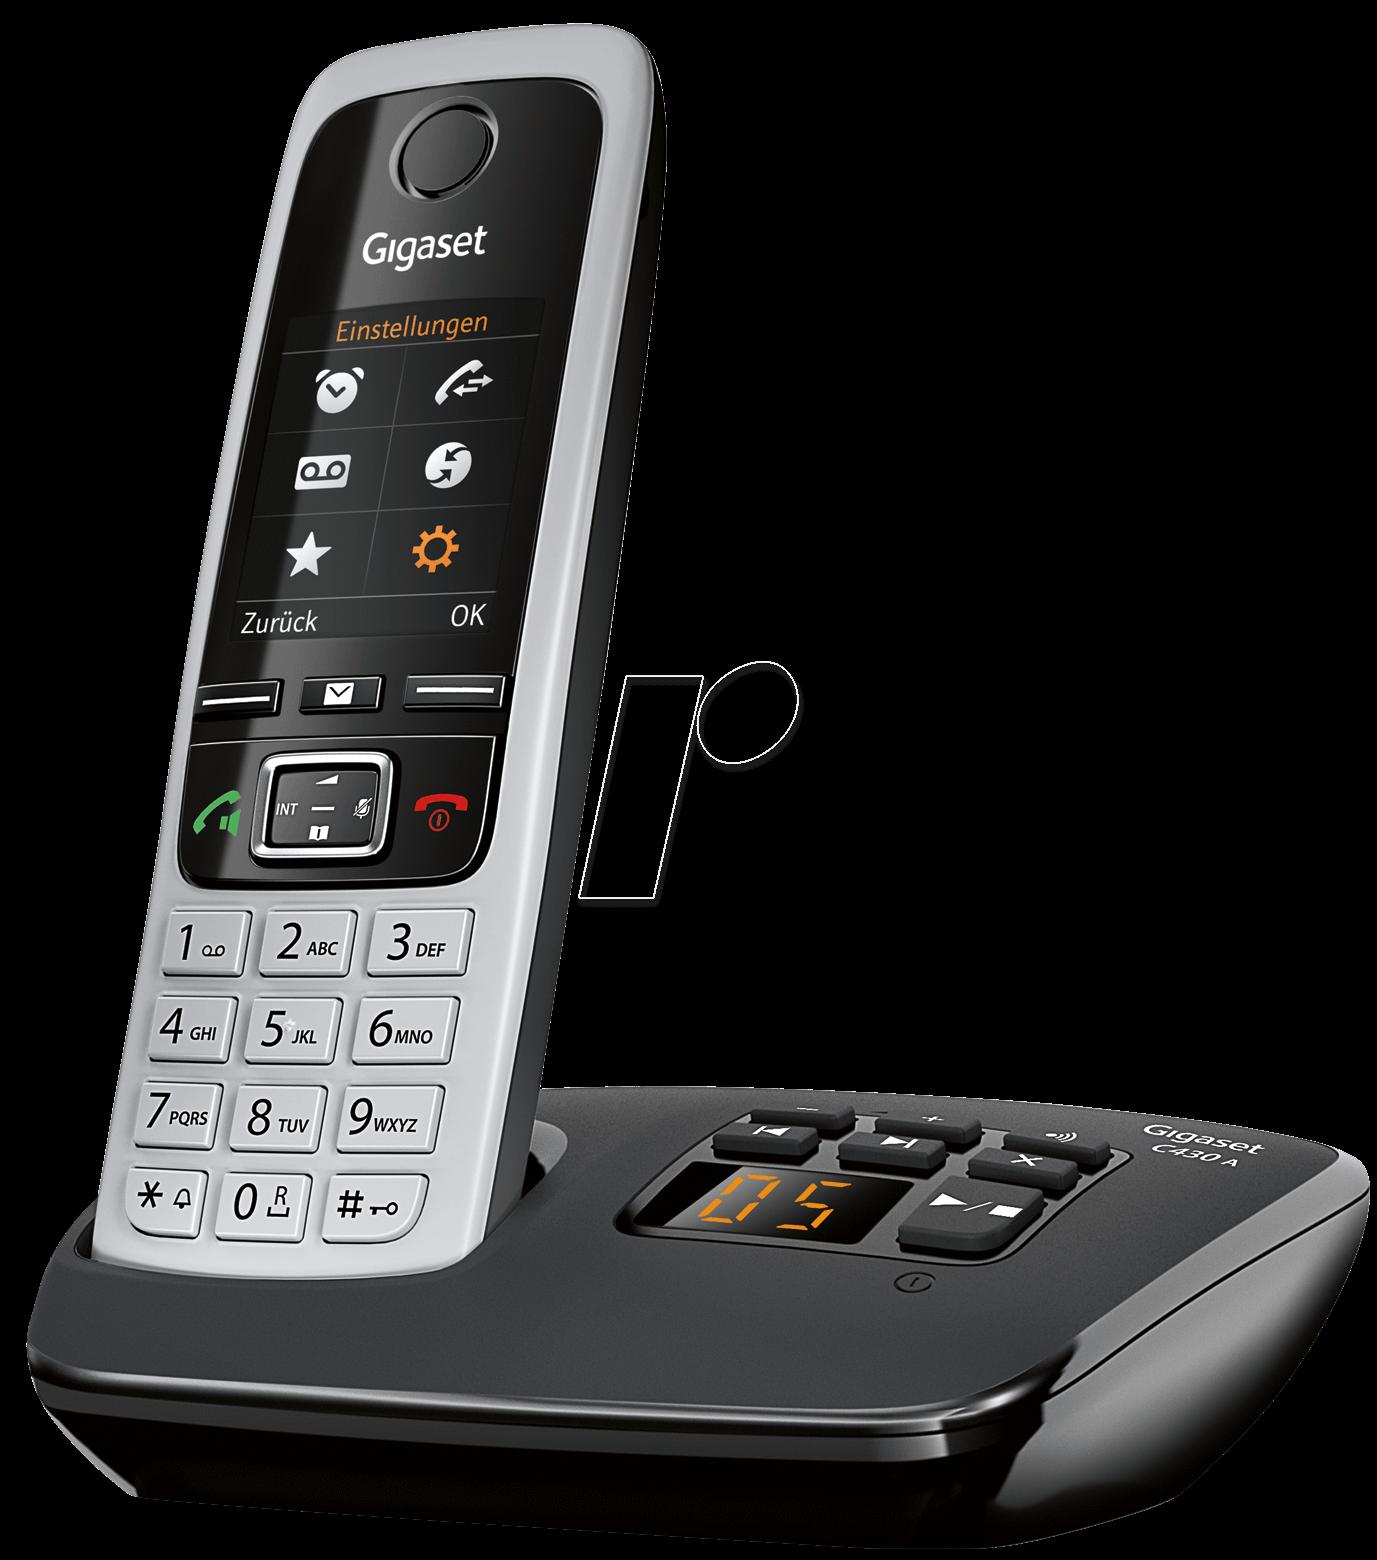 vendita-impianti-telefonici-analogici-digitali-rimini